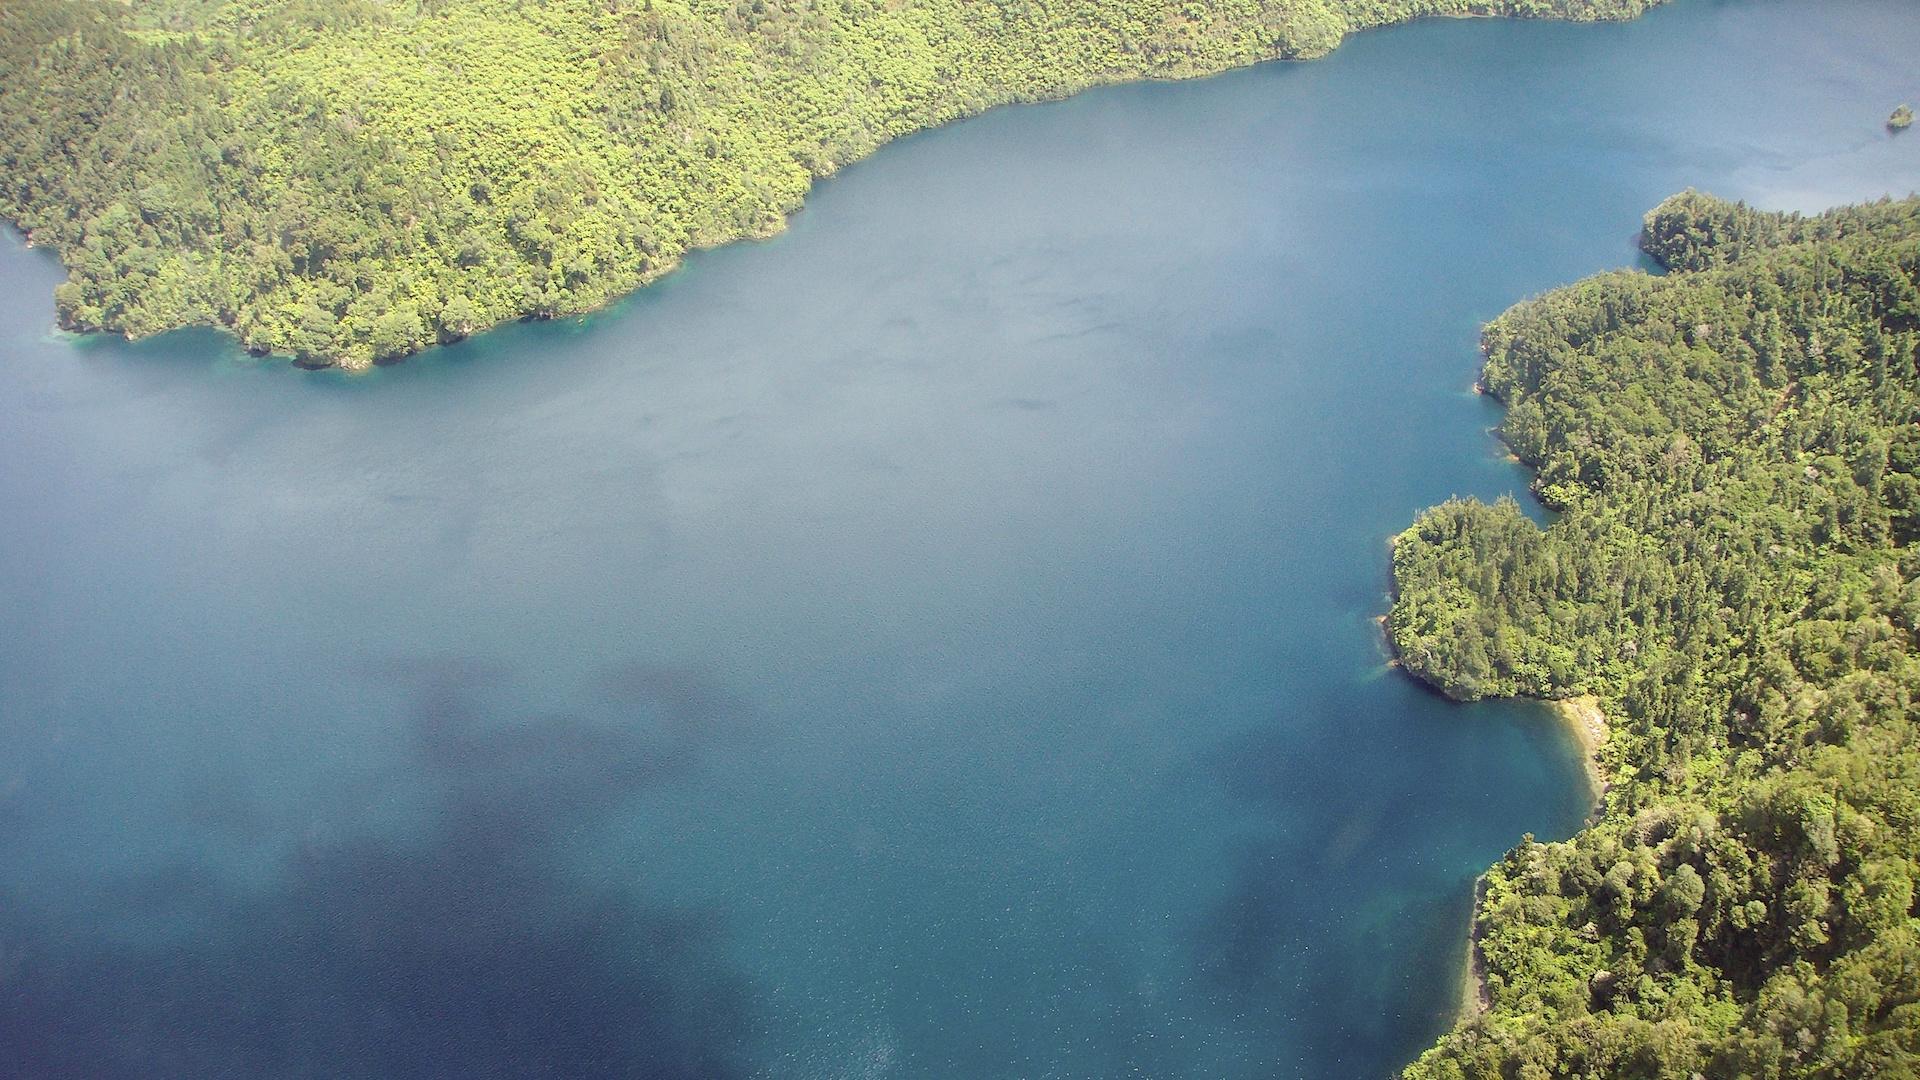 rotorua-nueva-zelanda-imagenes-27112016-in1